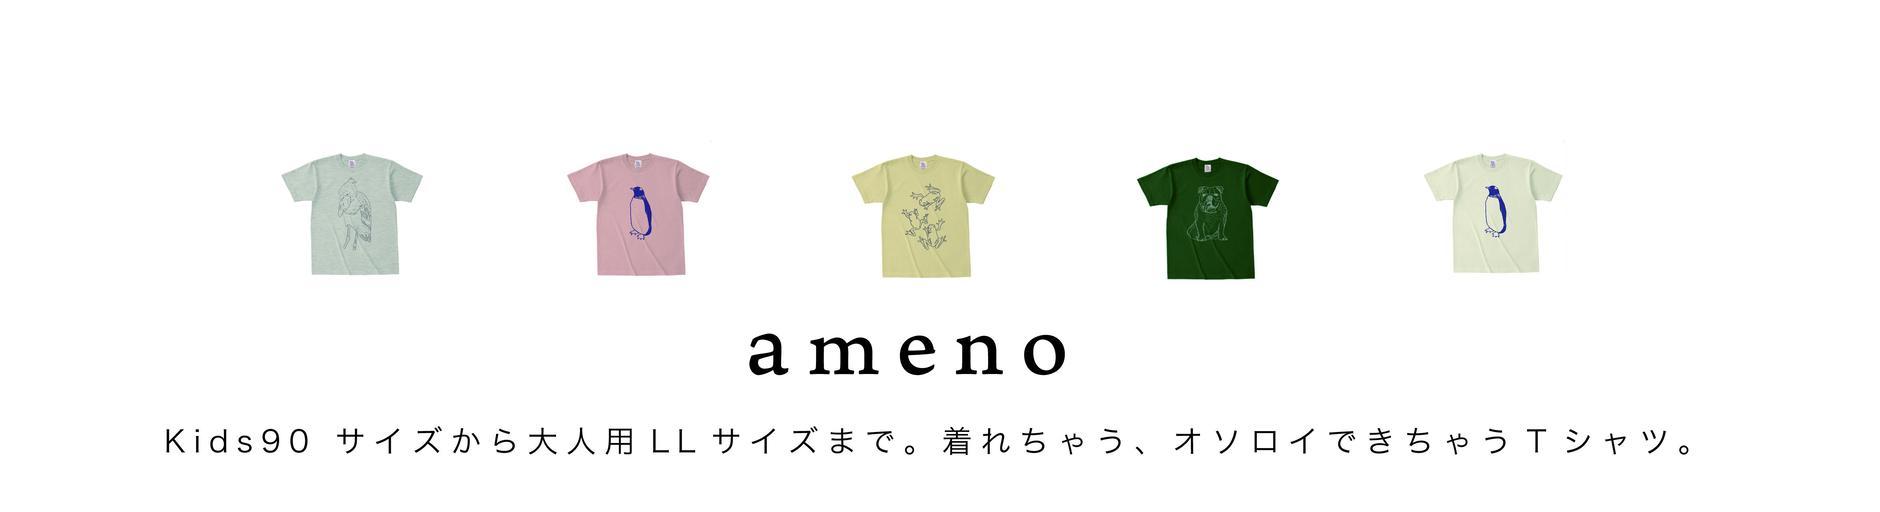 ameno online store